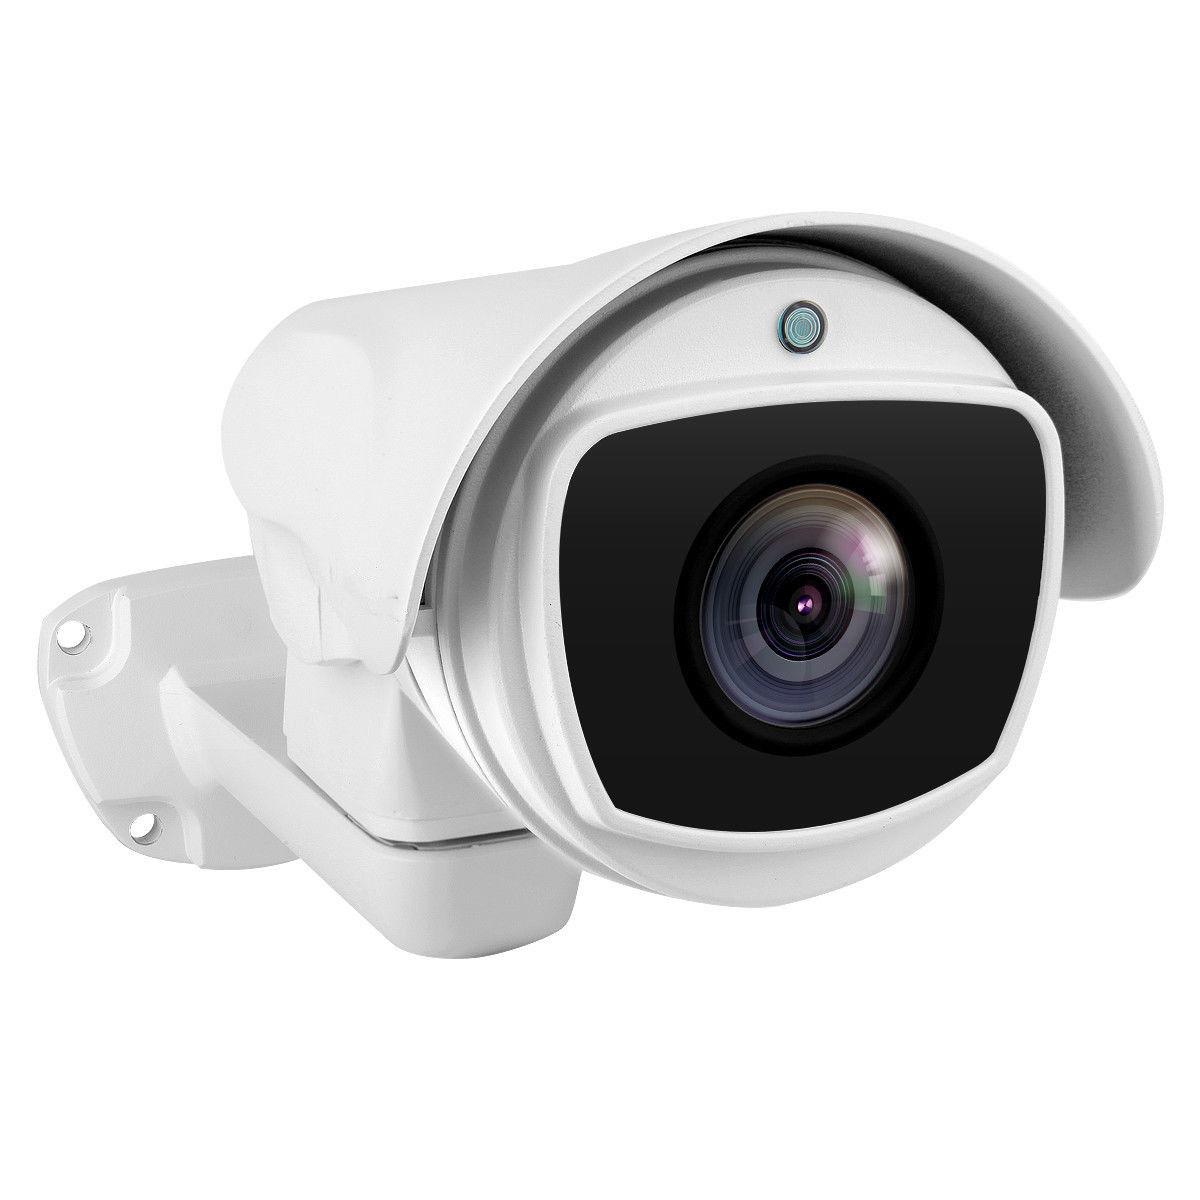 09d752e3fd1 PTZ IP Camera 2MP 4MP5MP HD Pan Tilt 4X 10x Optical Zoom Outdoor Waterproof  IR100m Night Vision Onvif Security Bullet Camera-in Surveillance Cameras  from ...